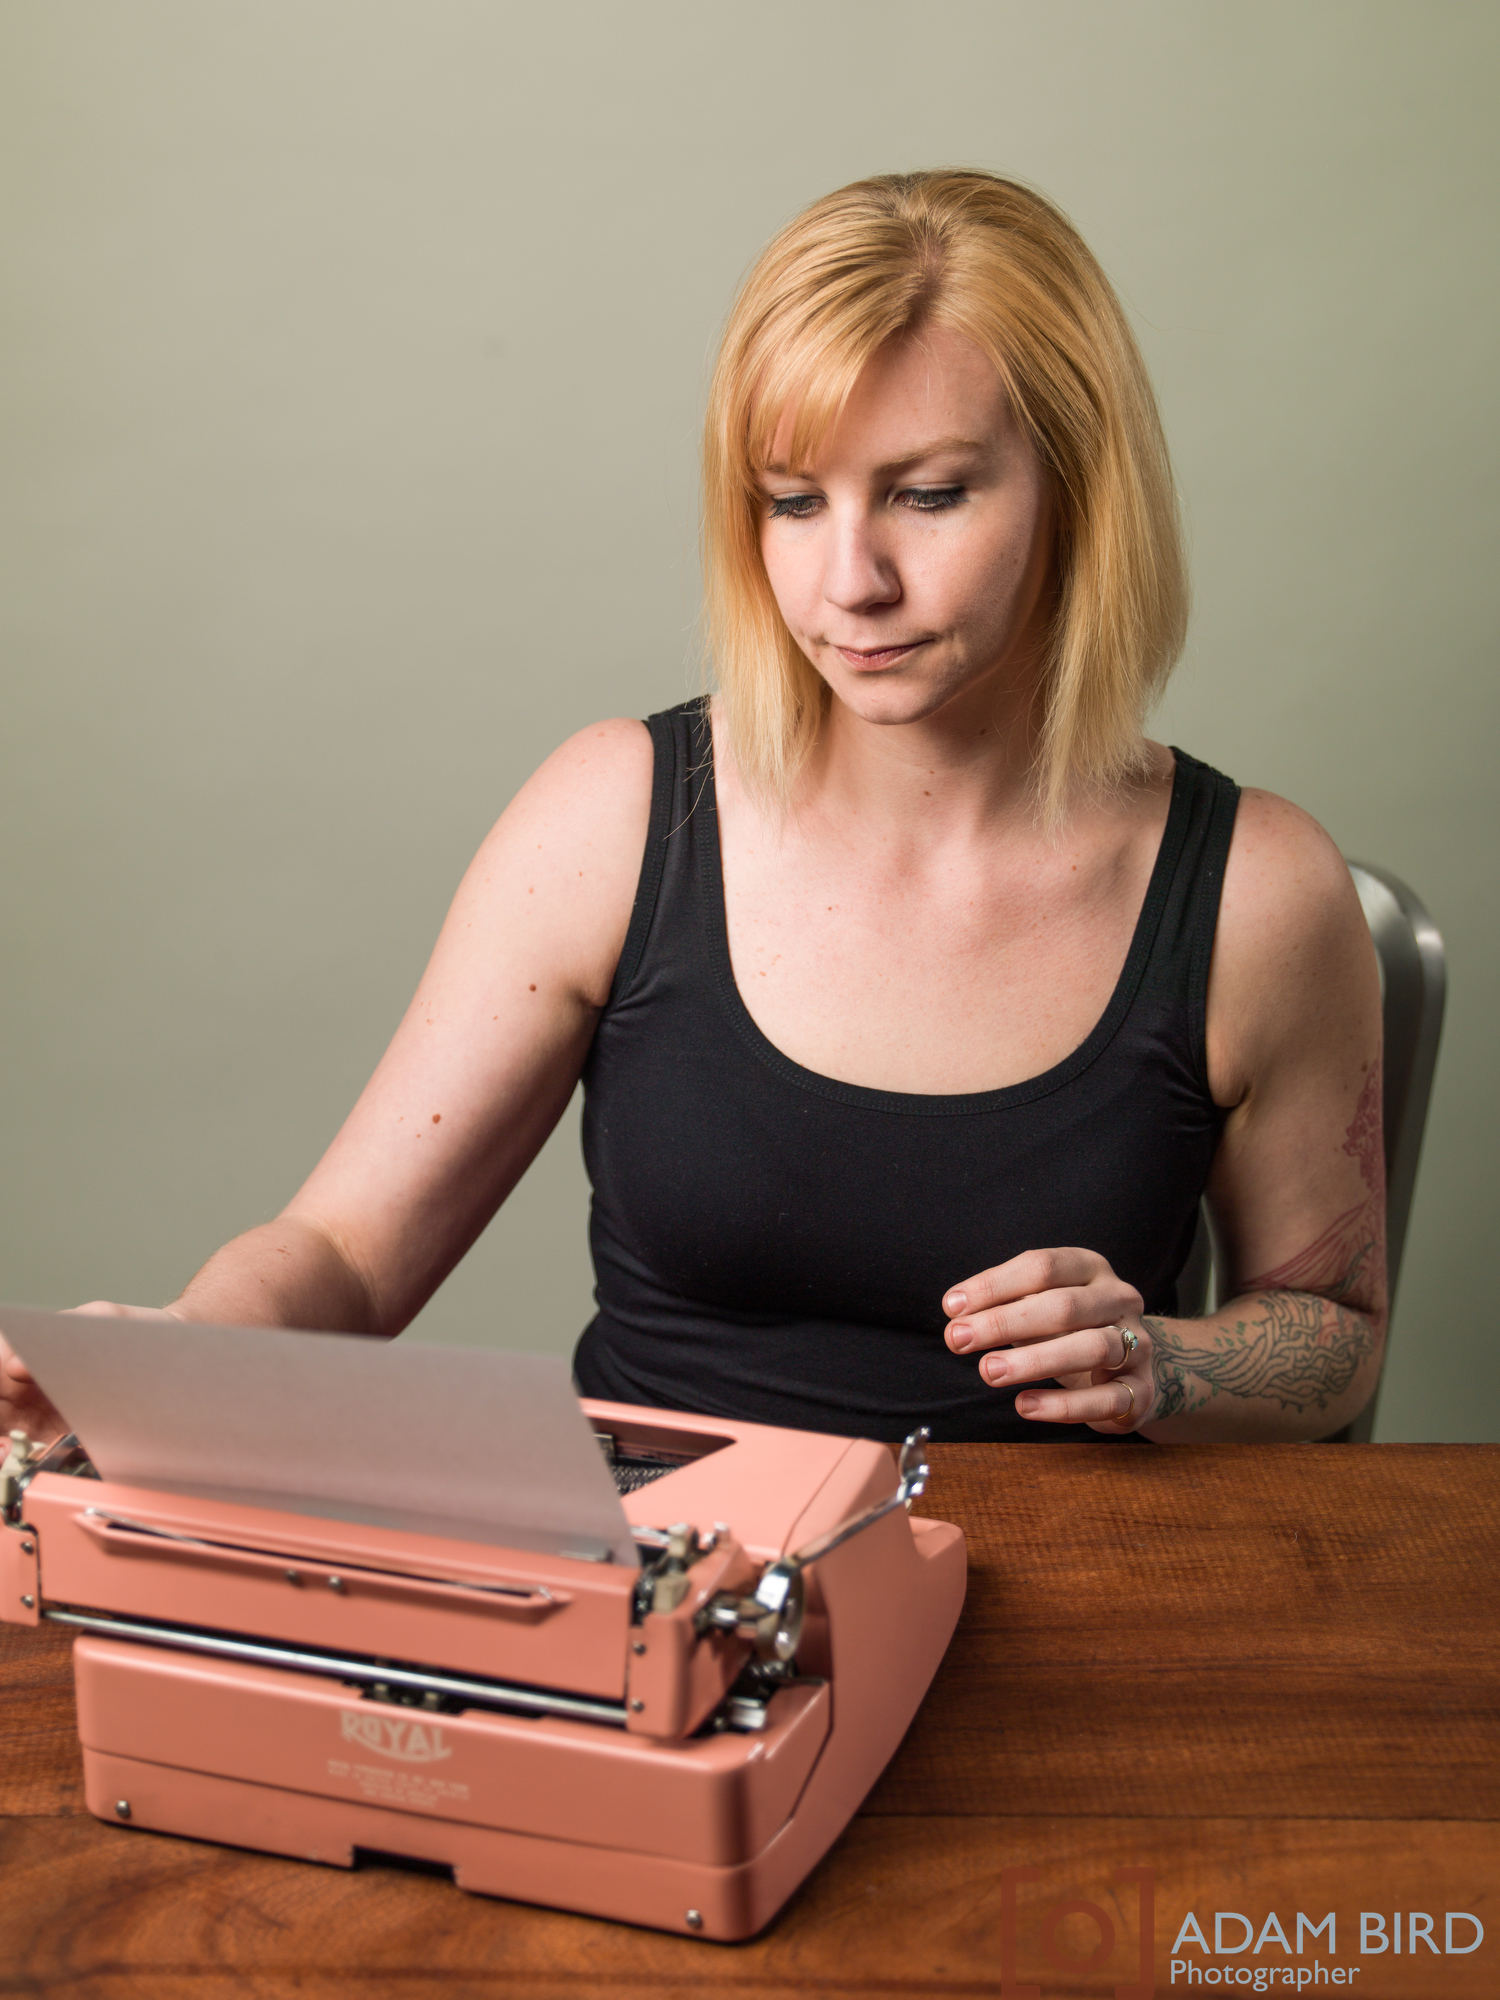 Marjorie Steele working on typewriter